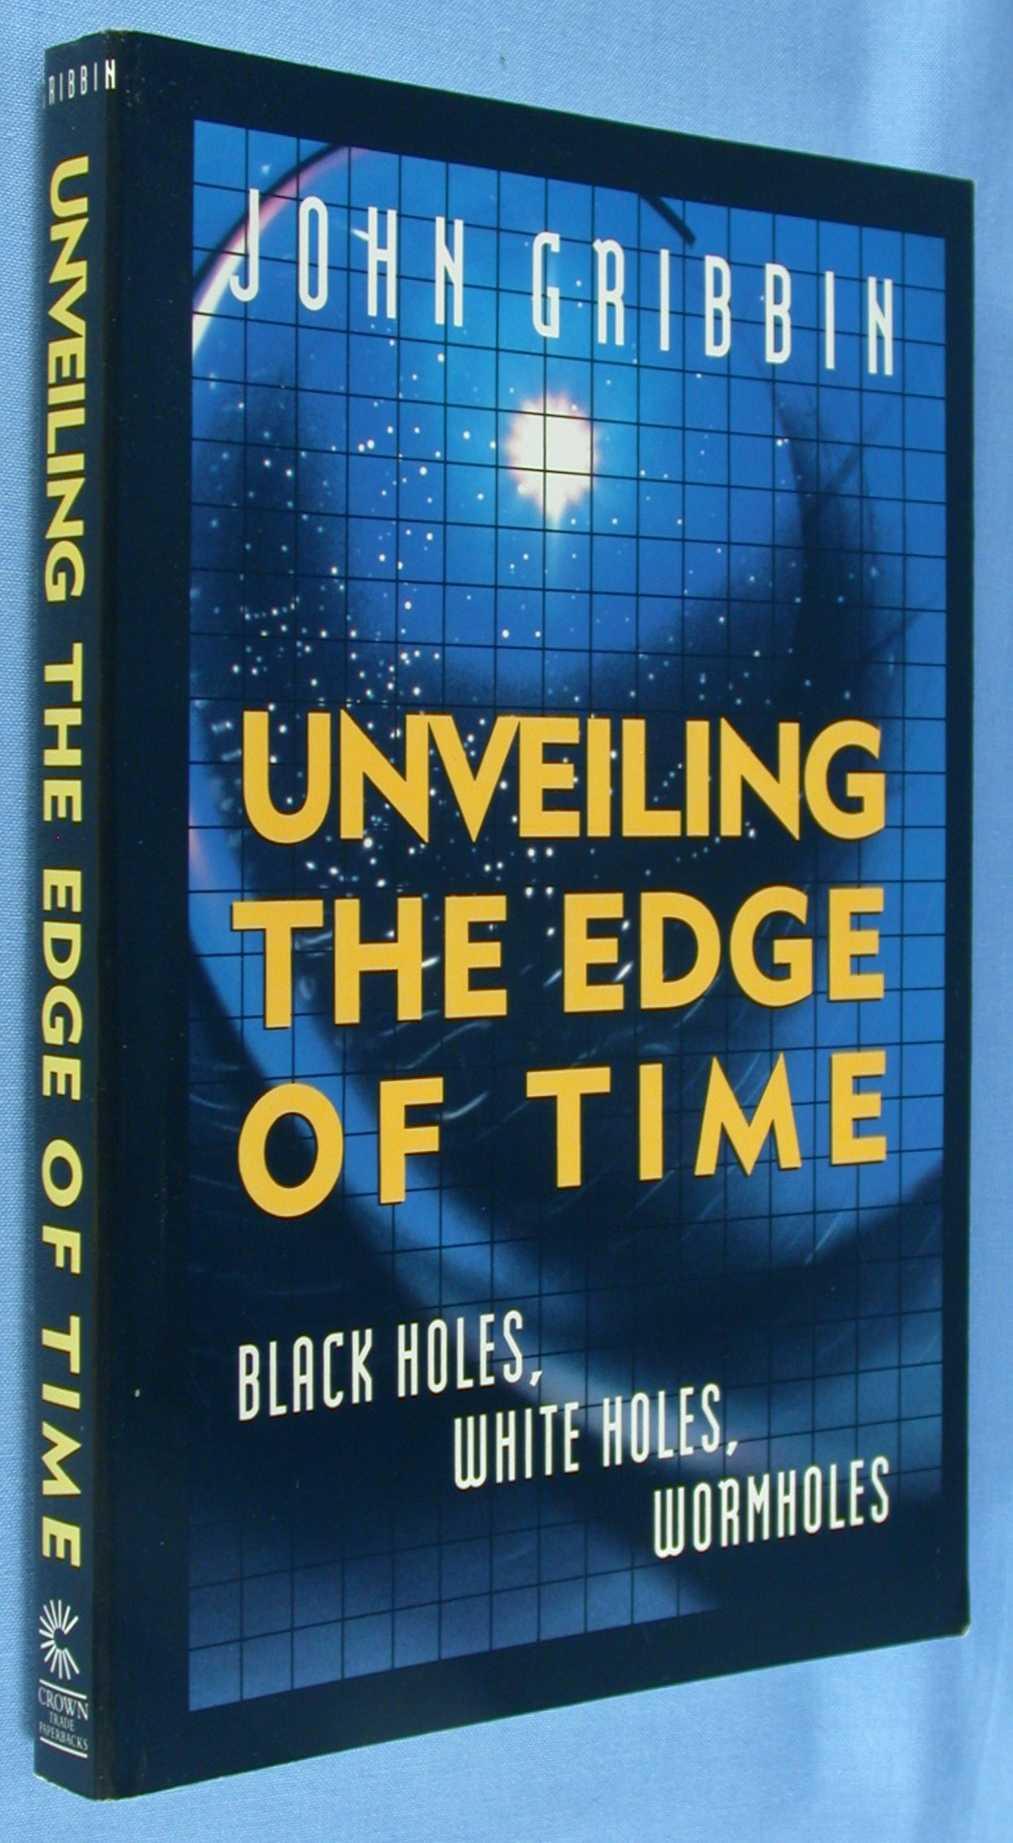 Unveiling the Edge of Time: Black Holes, White Holes, Wormholes, Gribbin, John